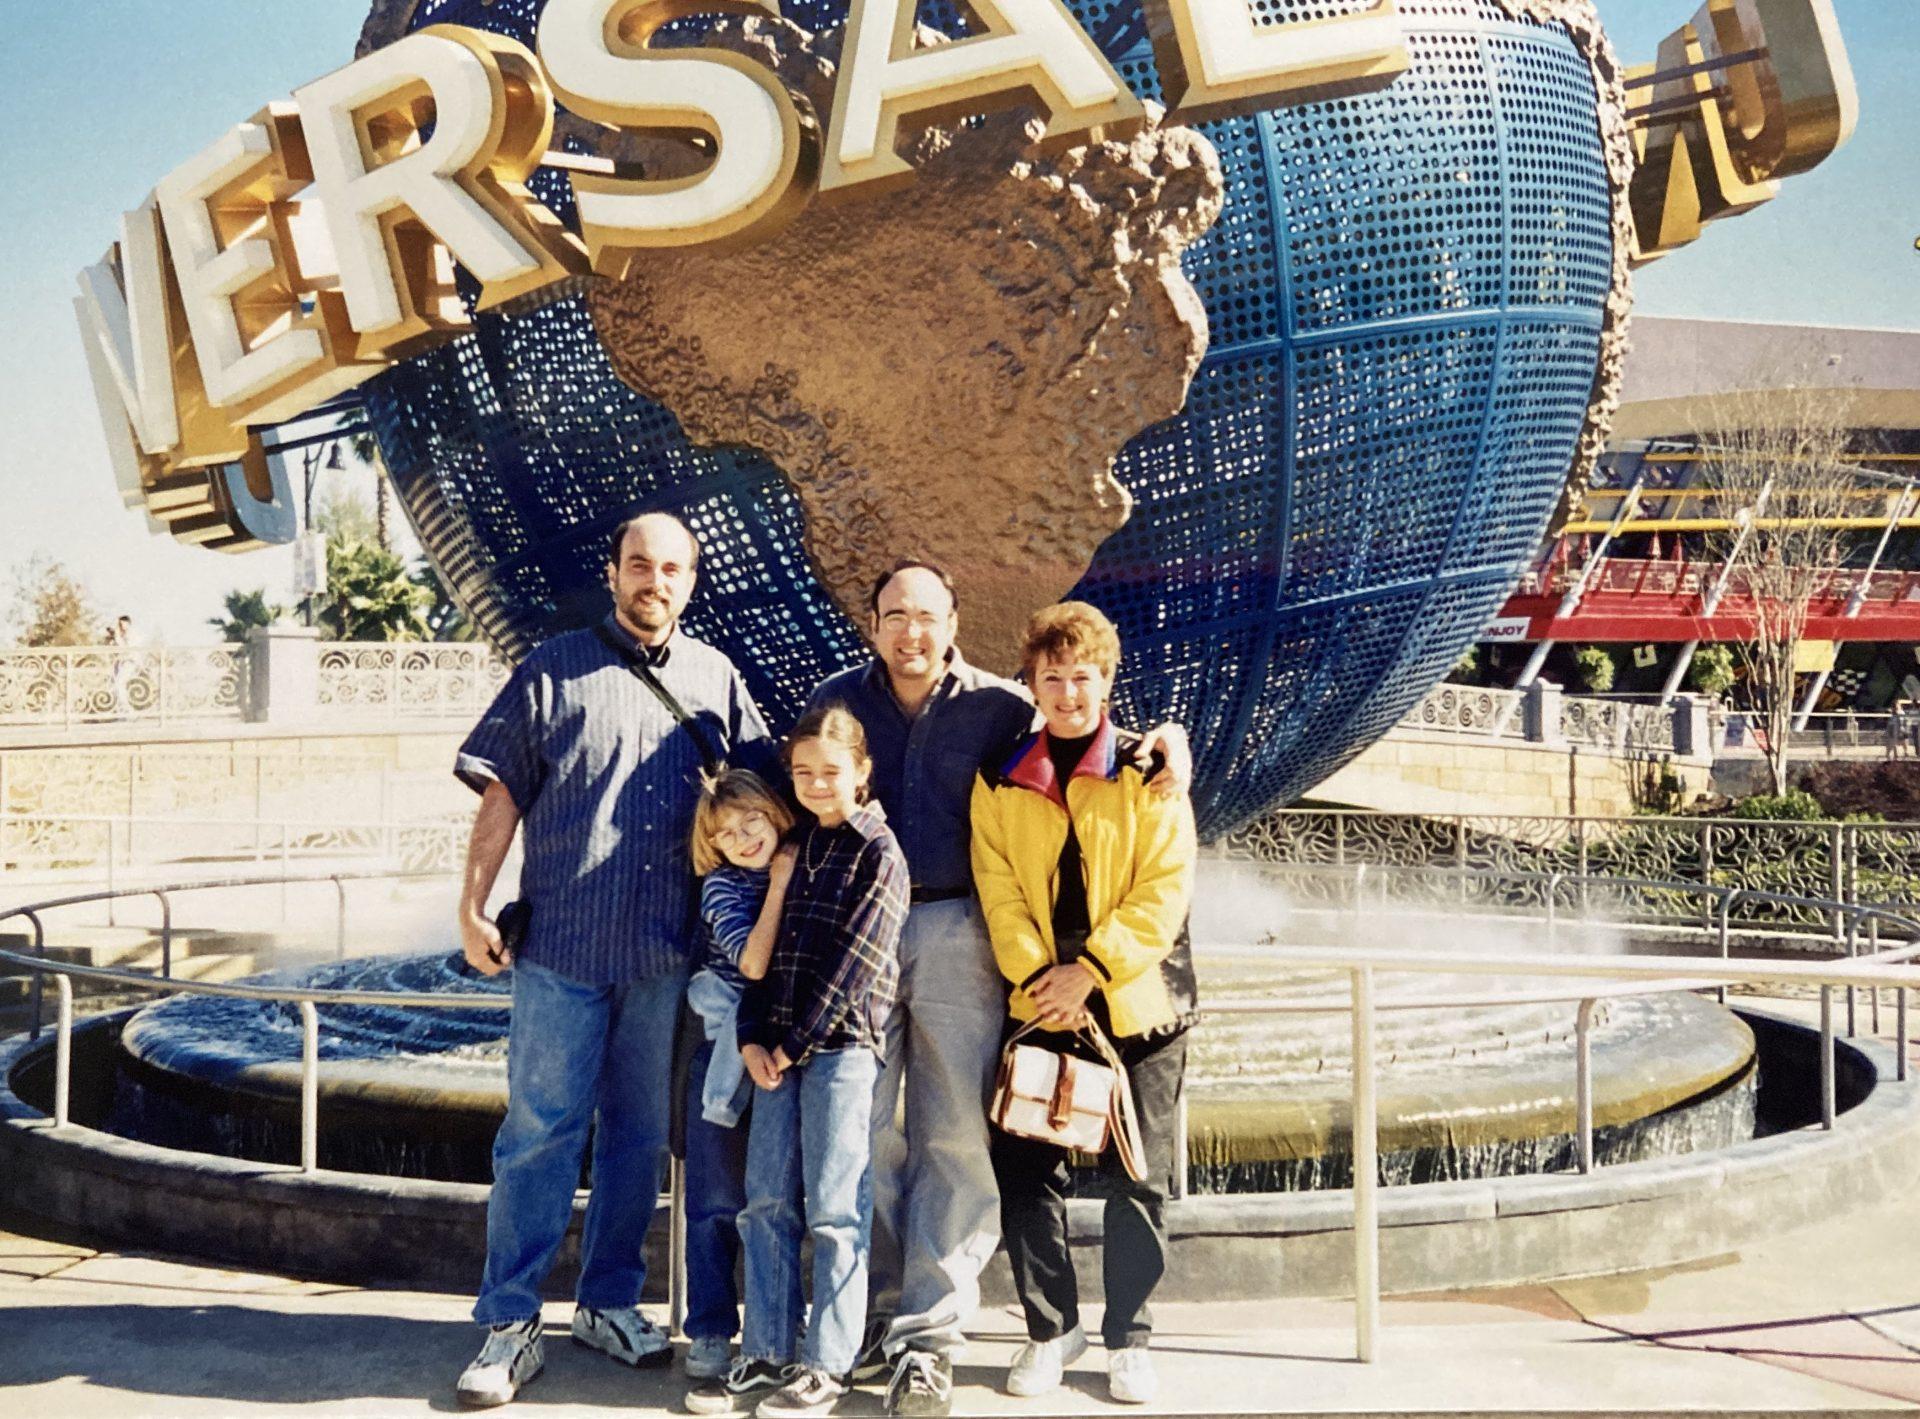 Universal Studios with Grandma and the kids.